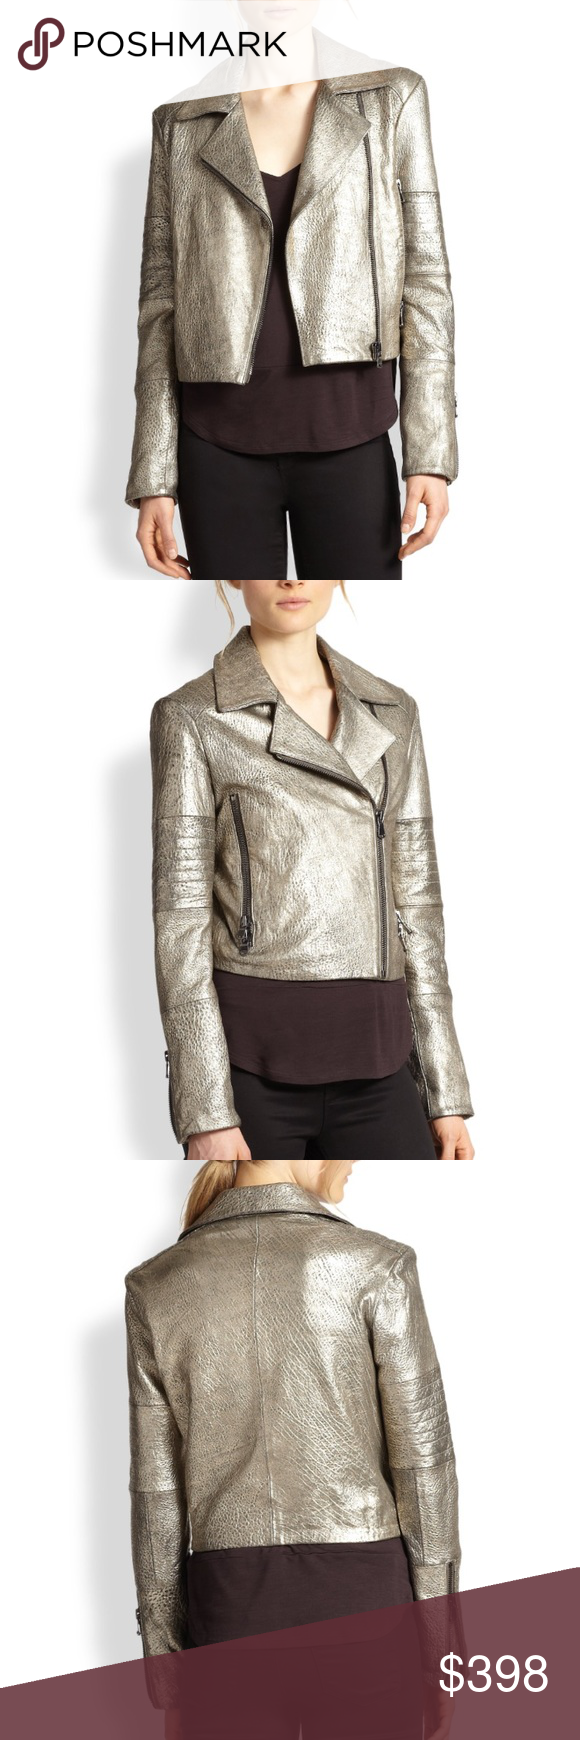 •J Brand• Aiah Metallic Leather Motorcycle Jacket